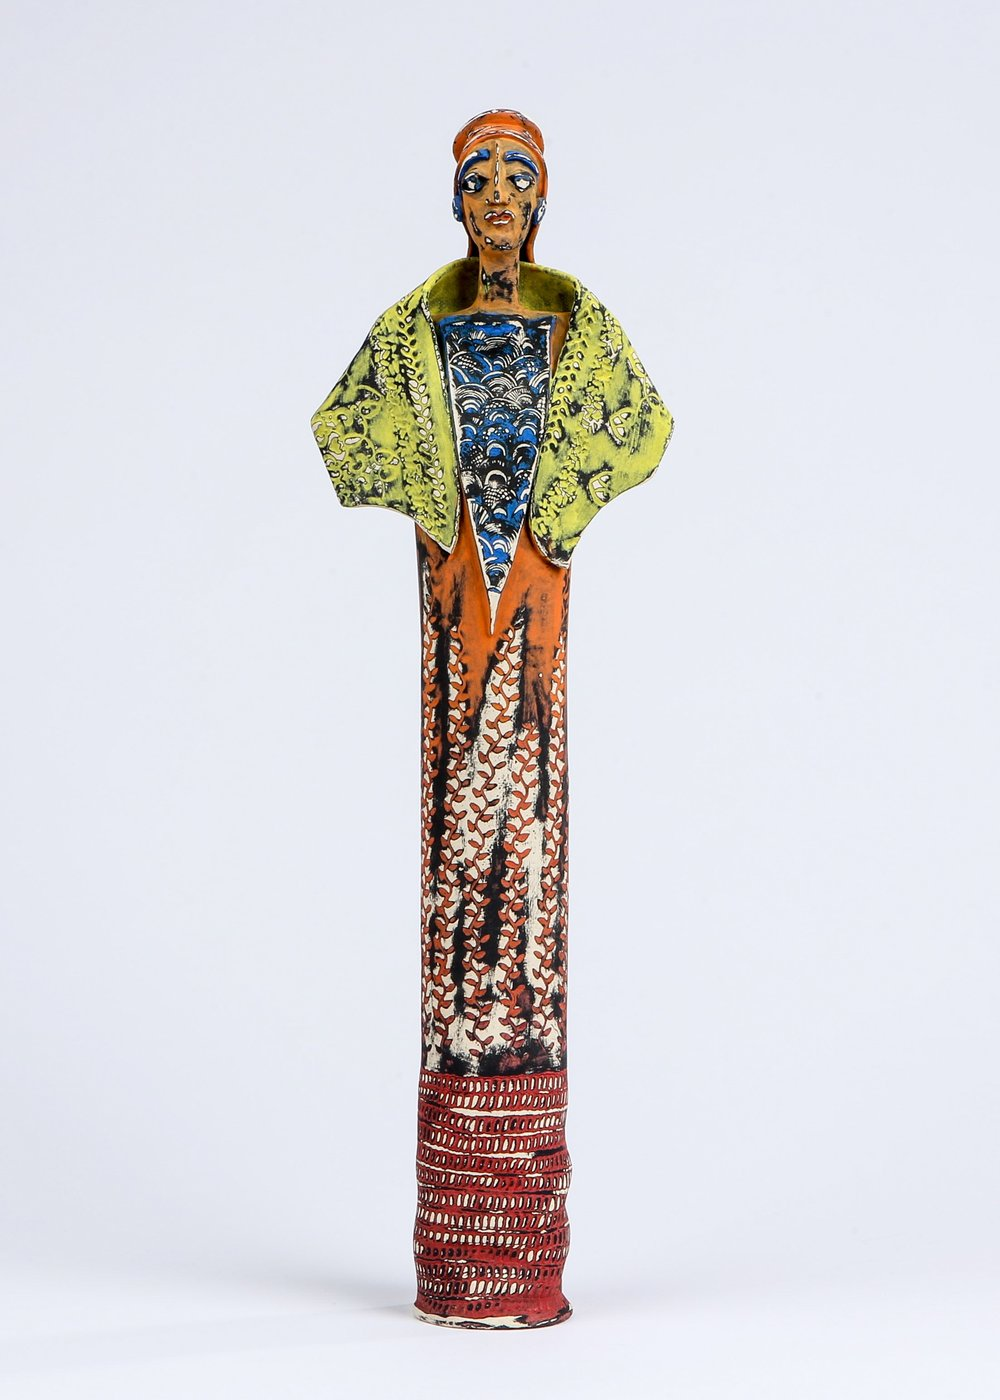 """Queen Ilana"" by Sharon Ramick, ceramic,4.5x22x3.5in, 2017 POR"